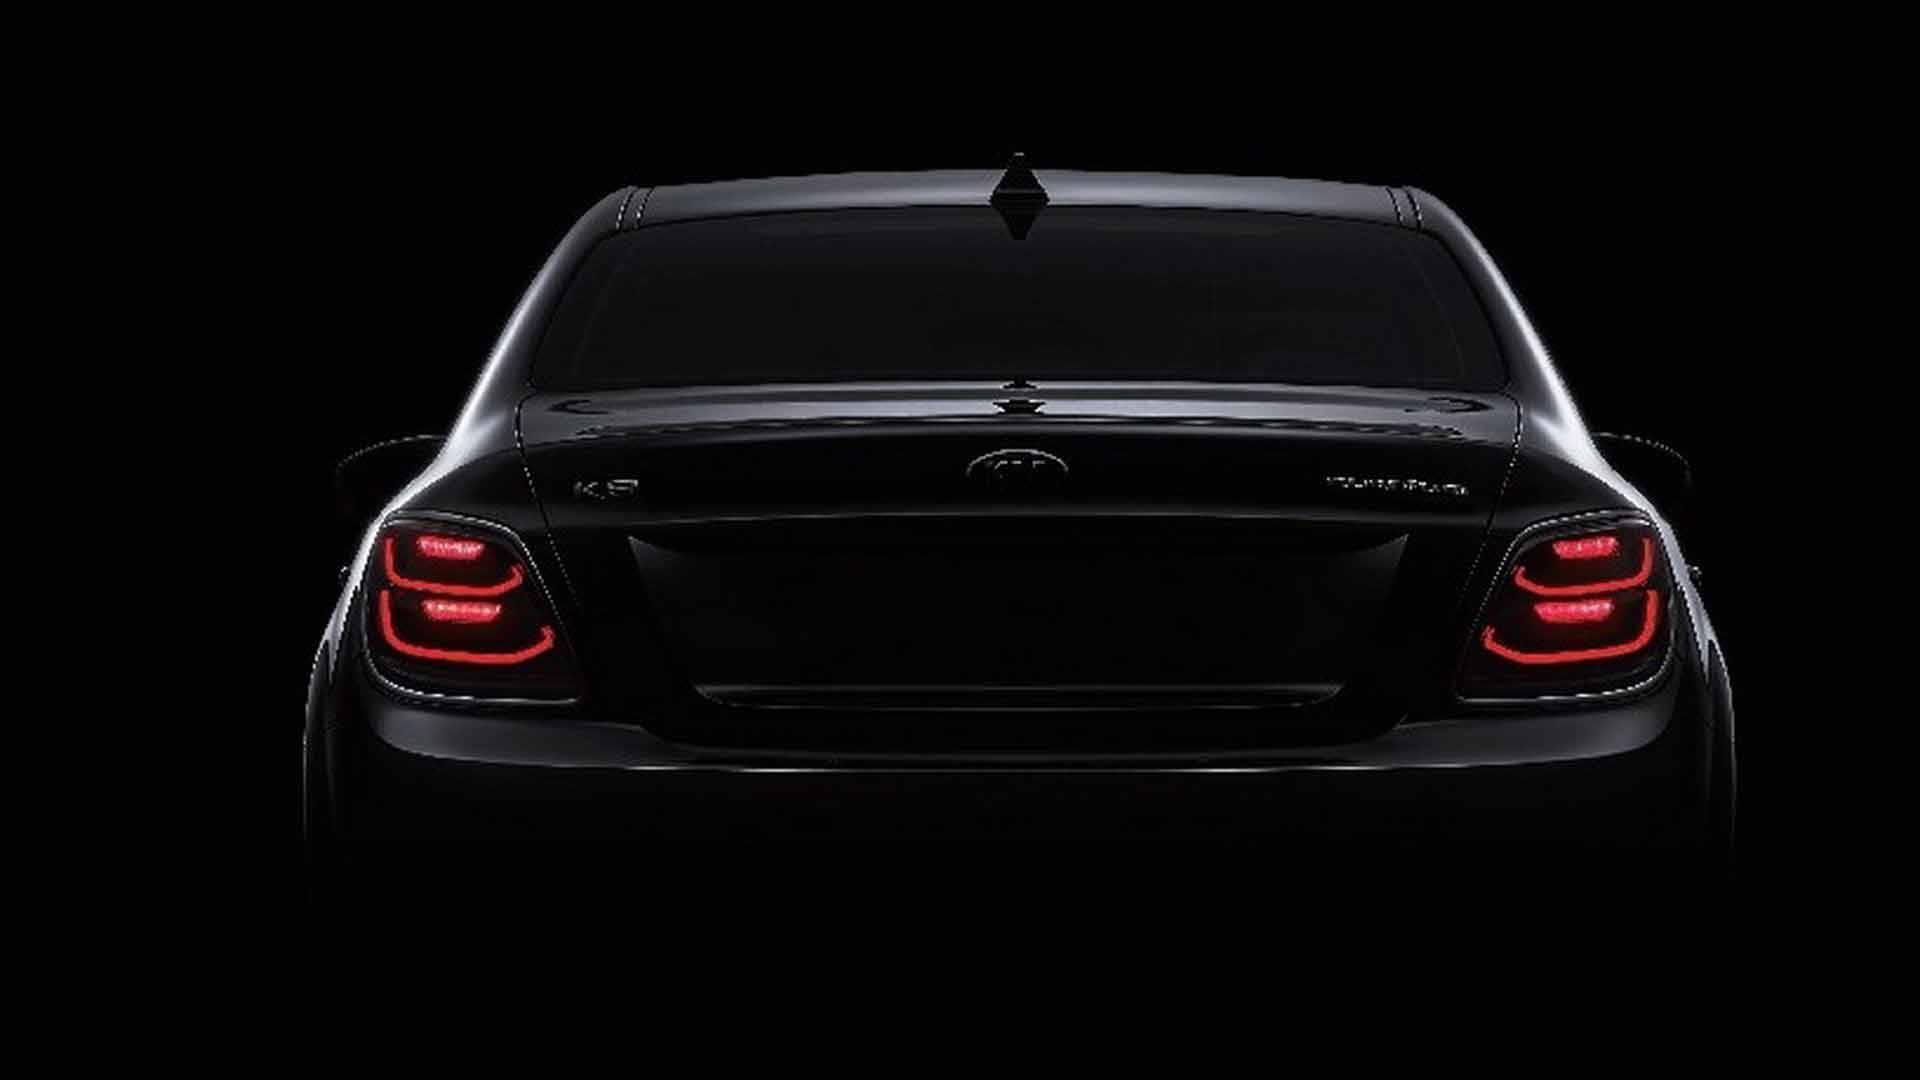 2019 Kia K900/K9 Facelift Teaser Shows New Headlights ...